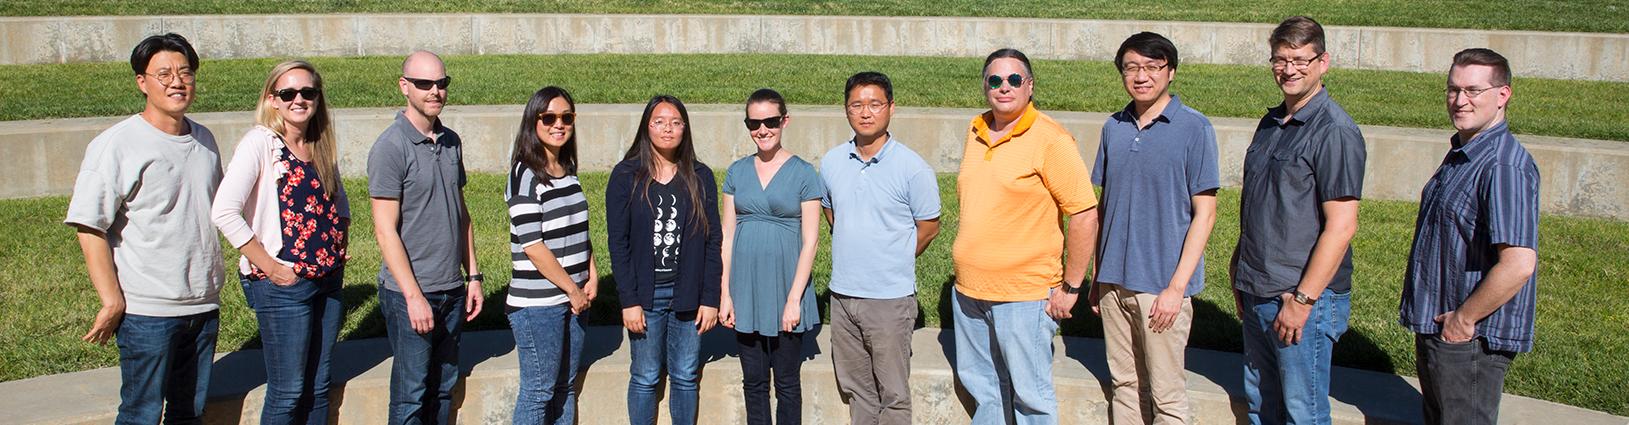 materials science team photo